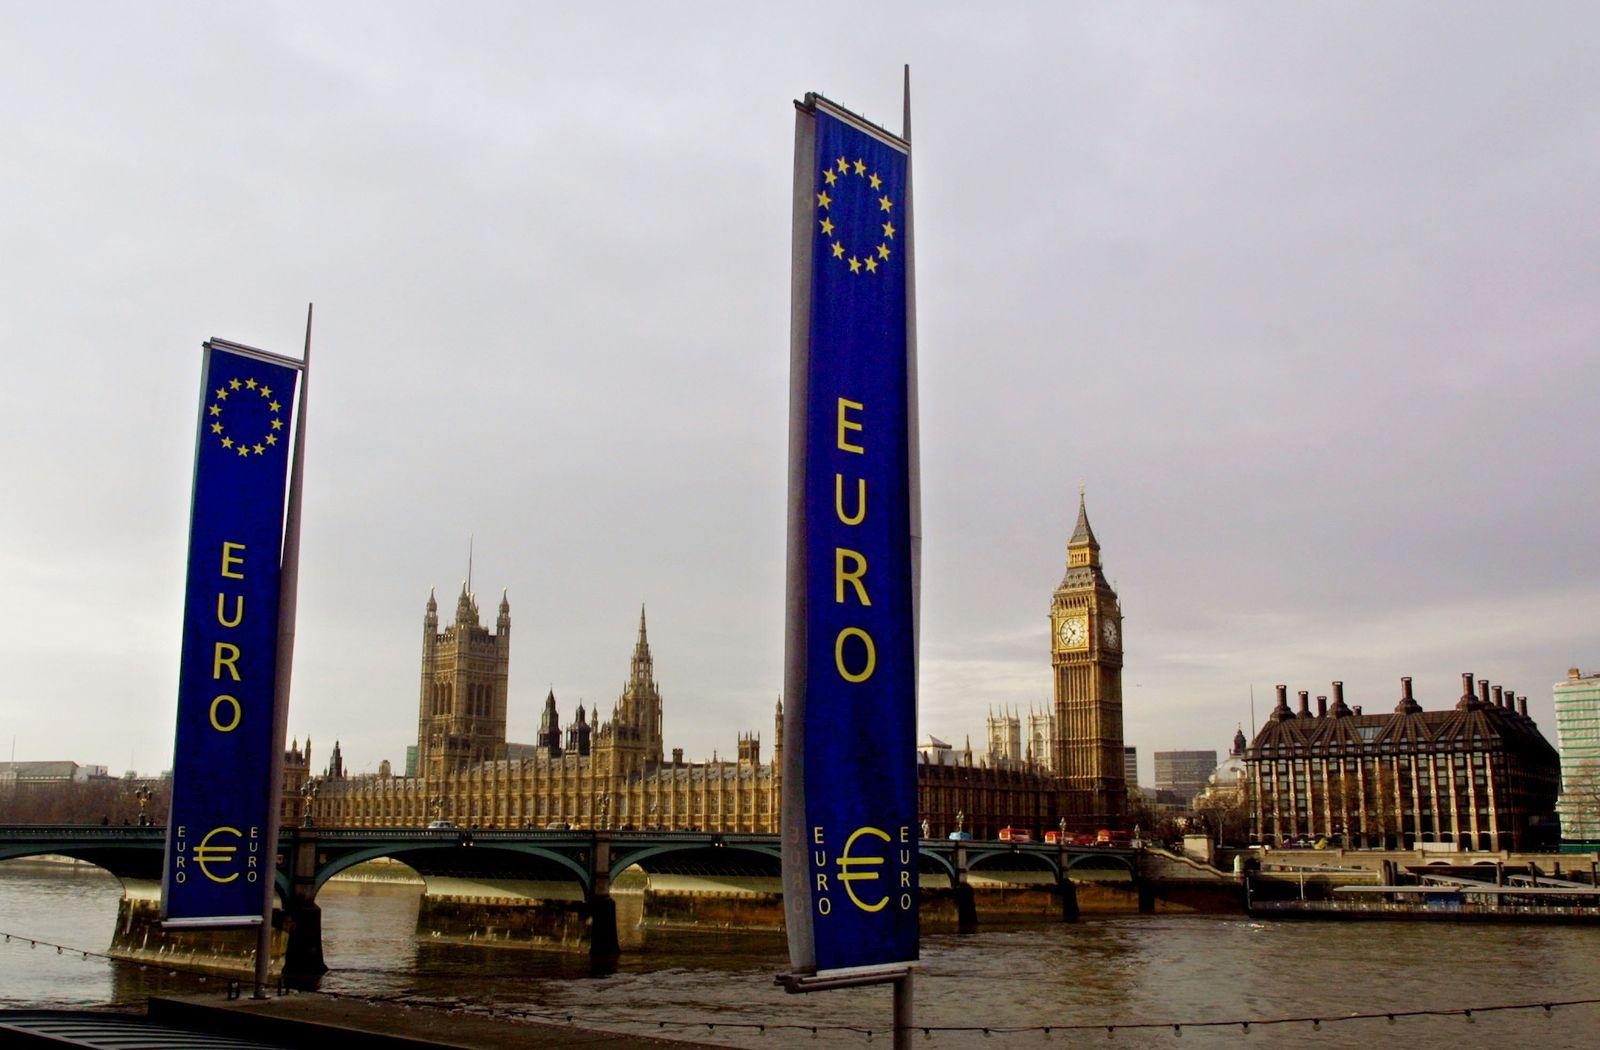 London / Eurobanner / Big Benn